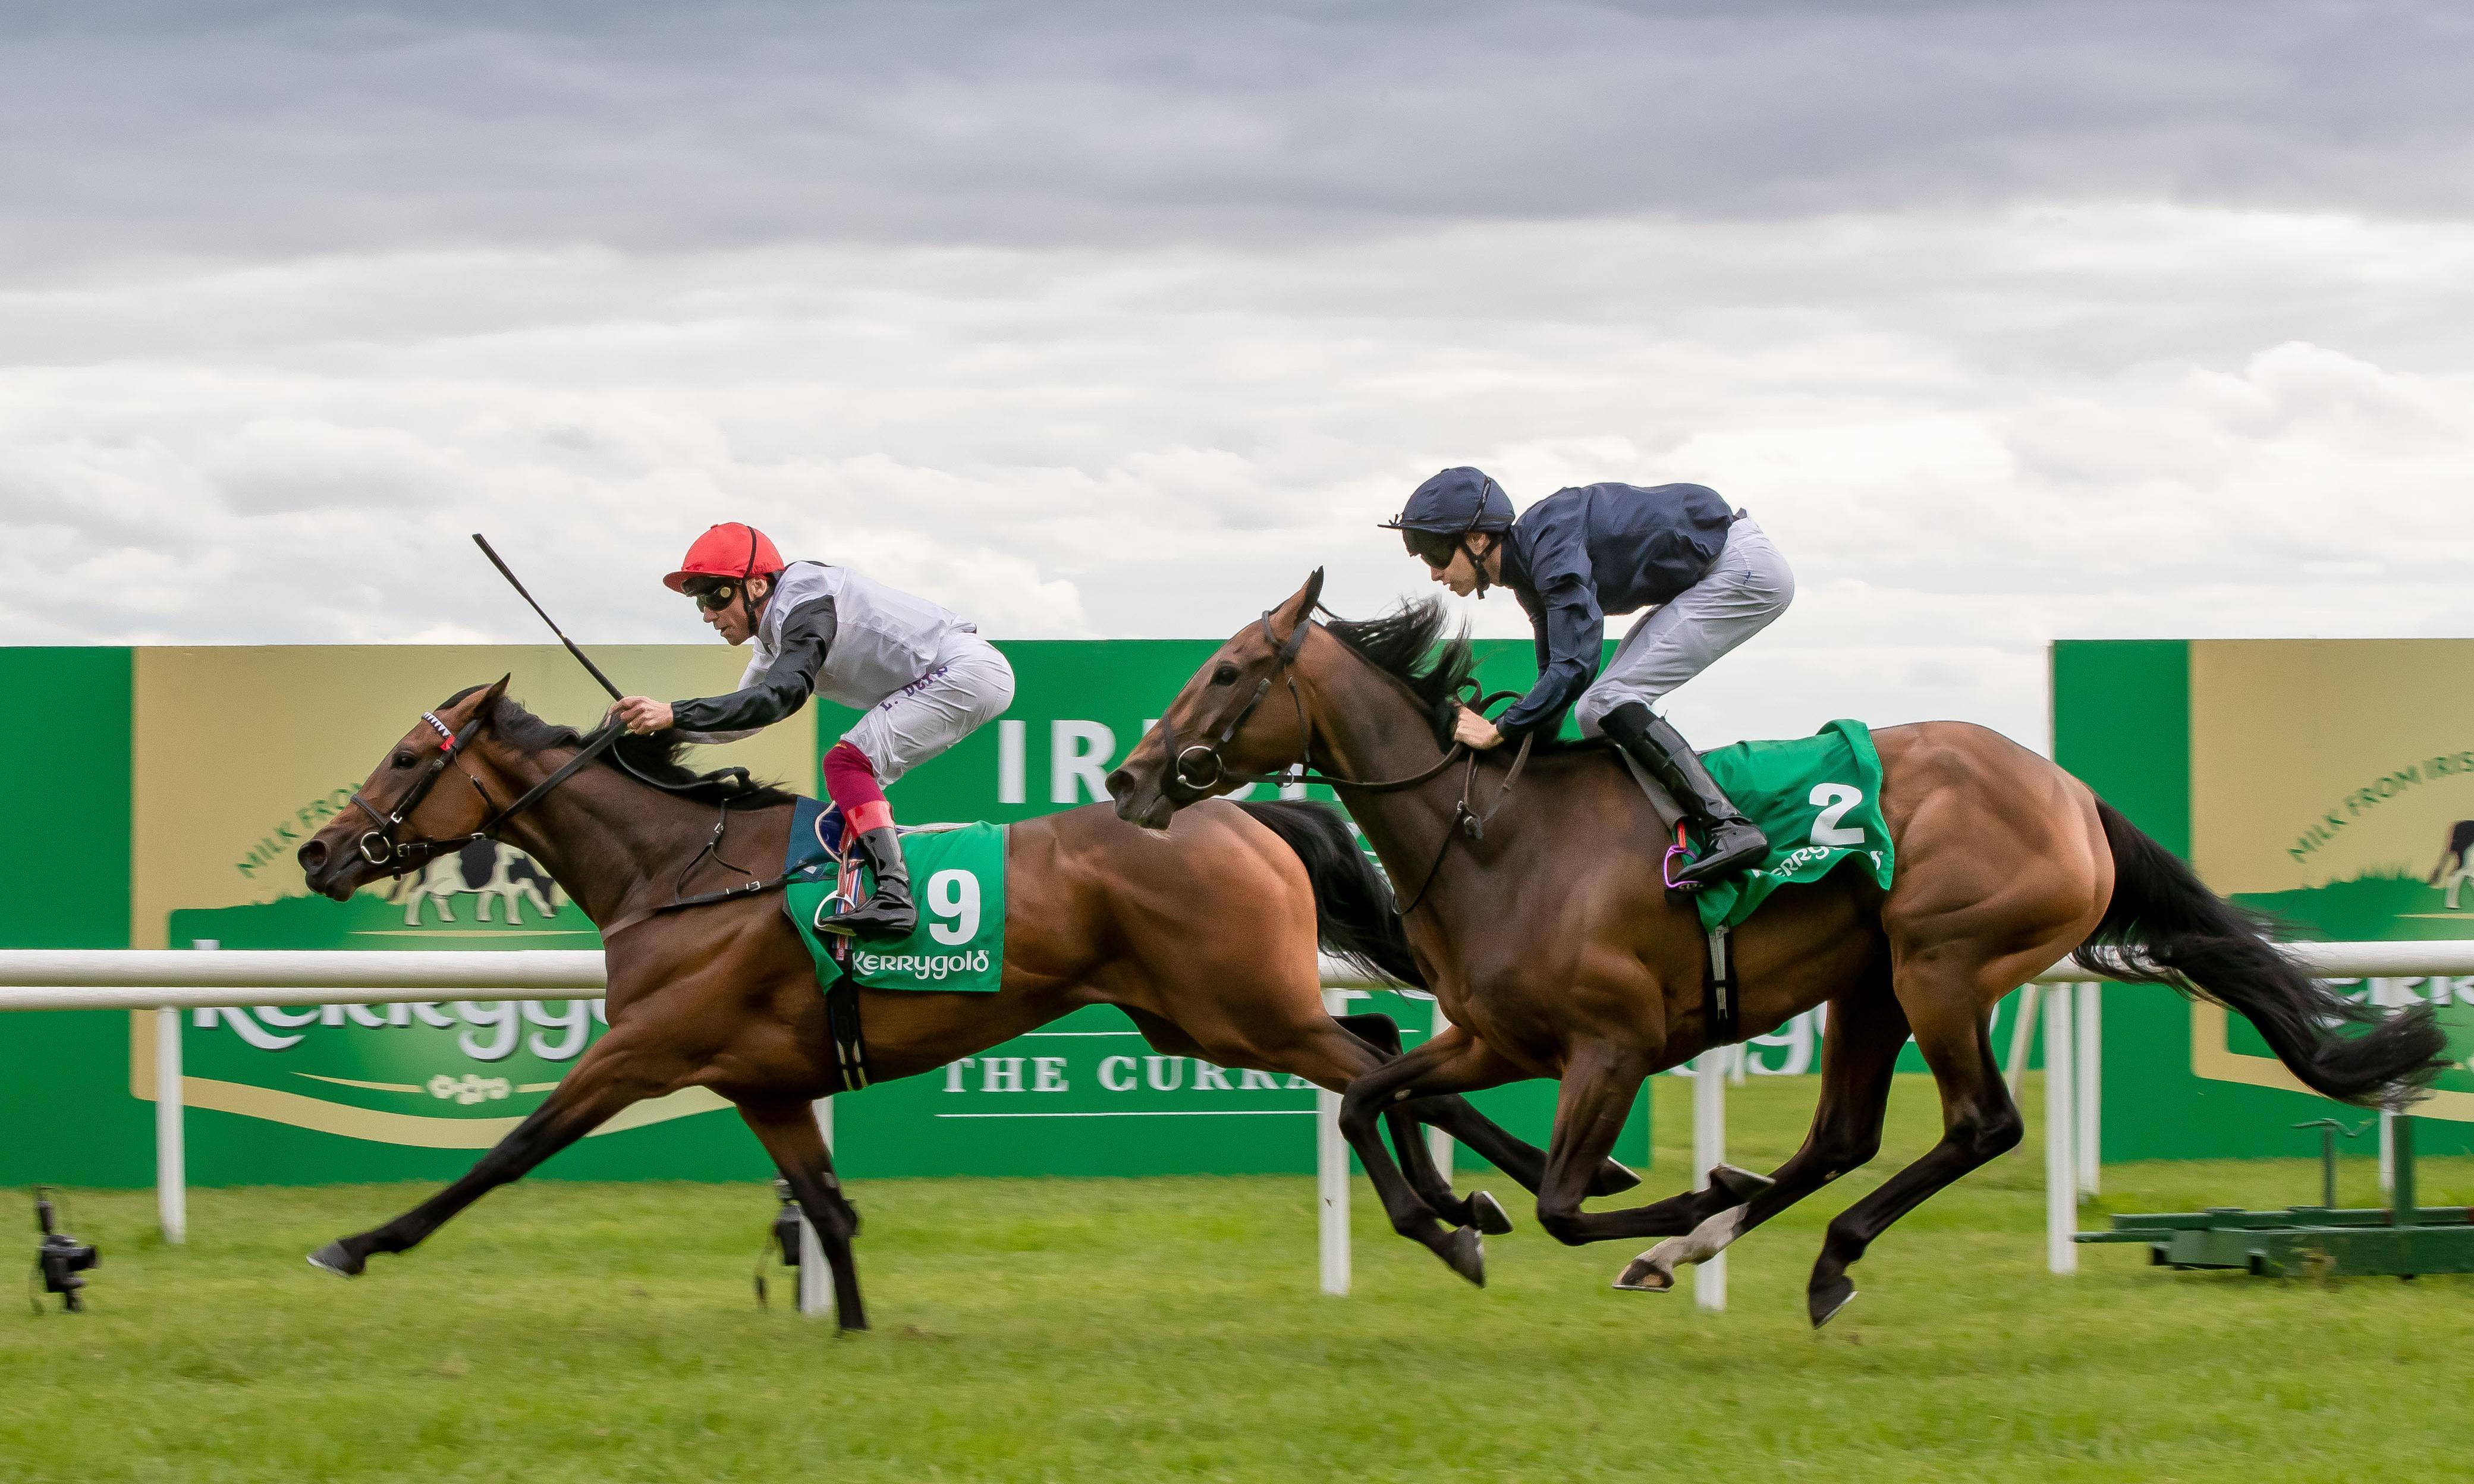 Frankie Dettori and Star Catcher shine brightest to win Irish Oaks